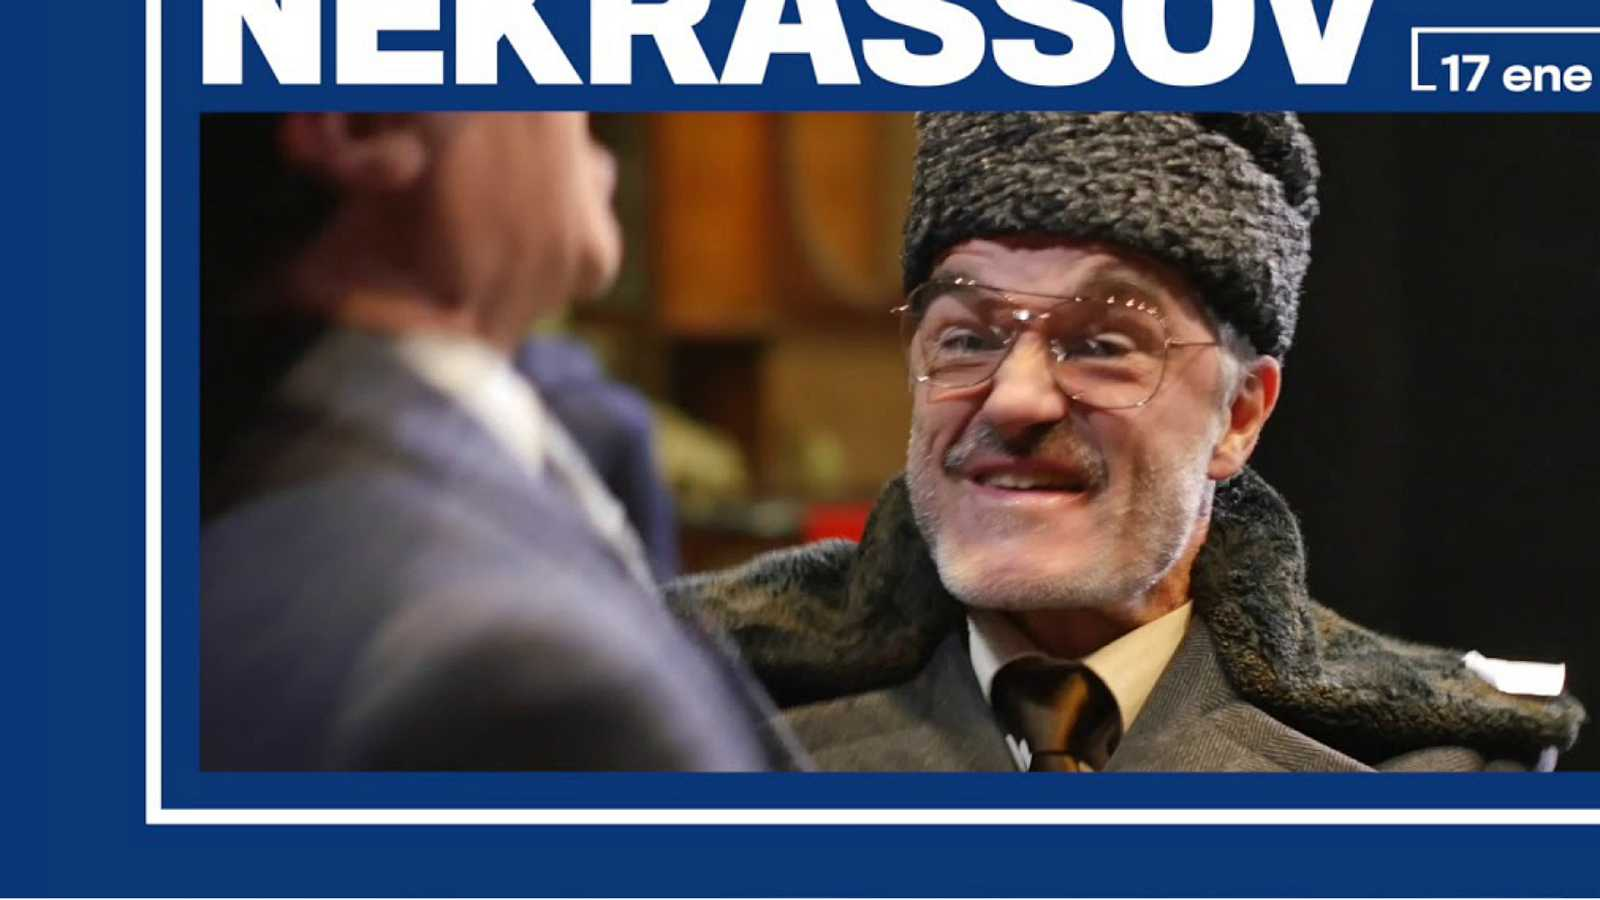 Literatro - Reposición de 'Nekrassov' - 10/01/20 - Escuchar ahora